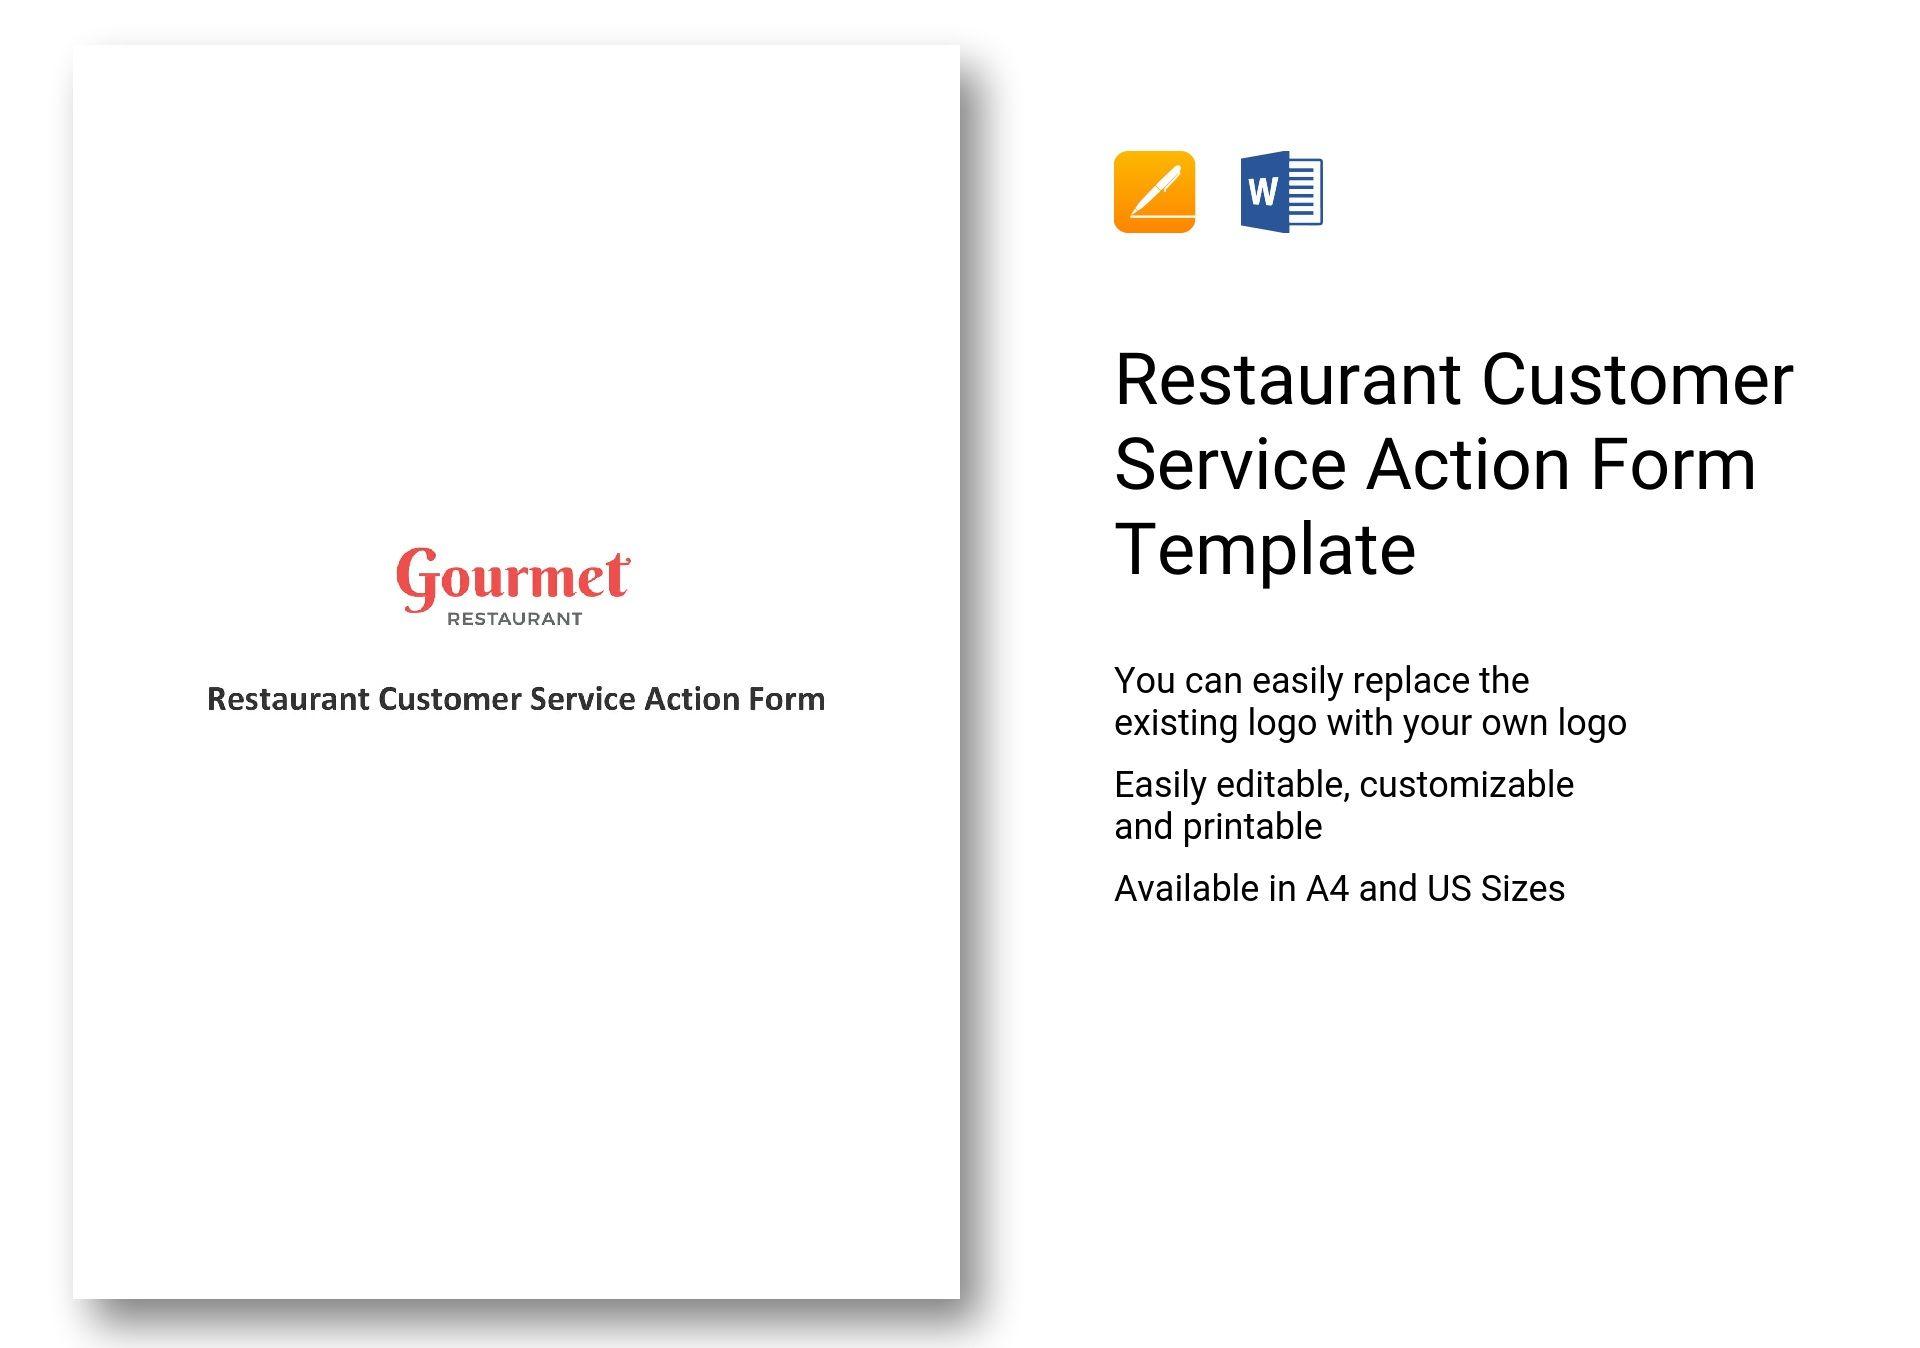 Restaurant Customer Service Action Form